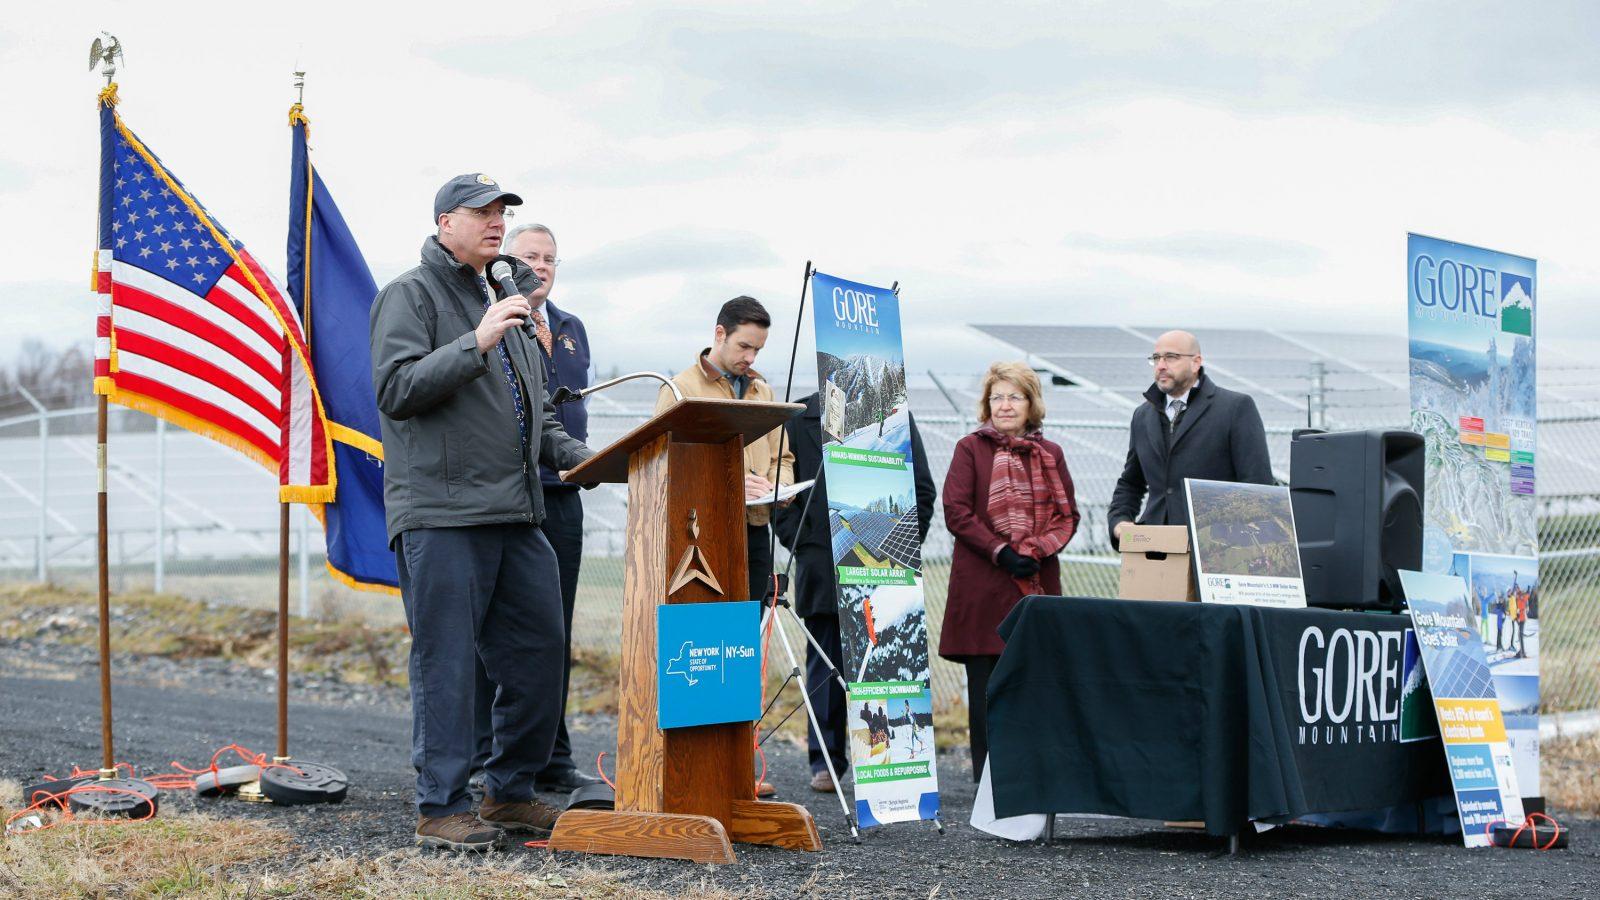 Gore Mountain benefits from Whitehall solar array